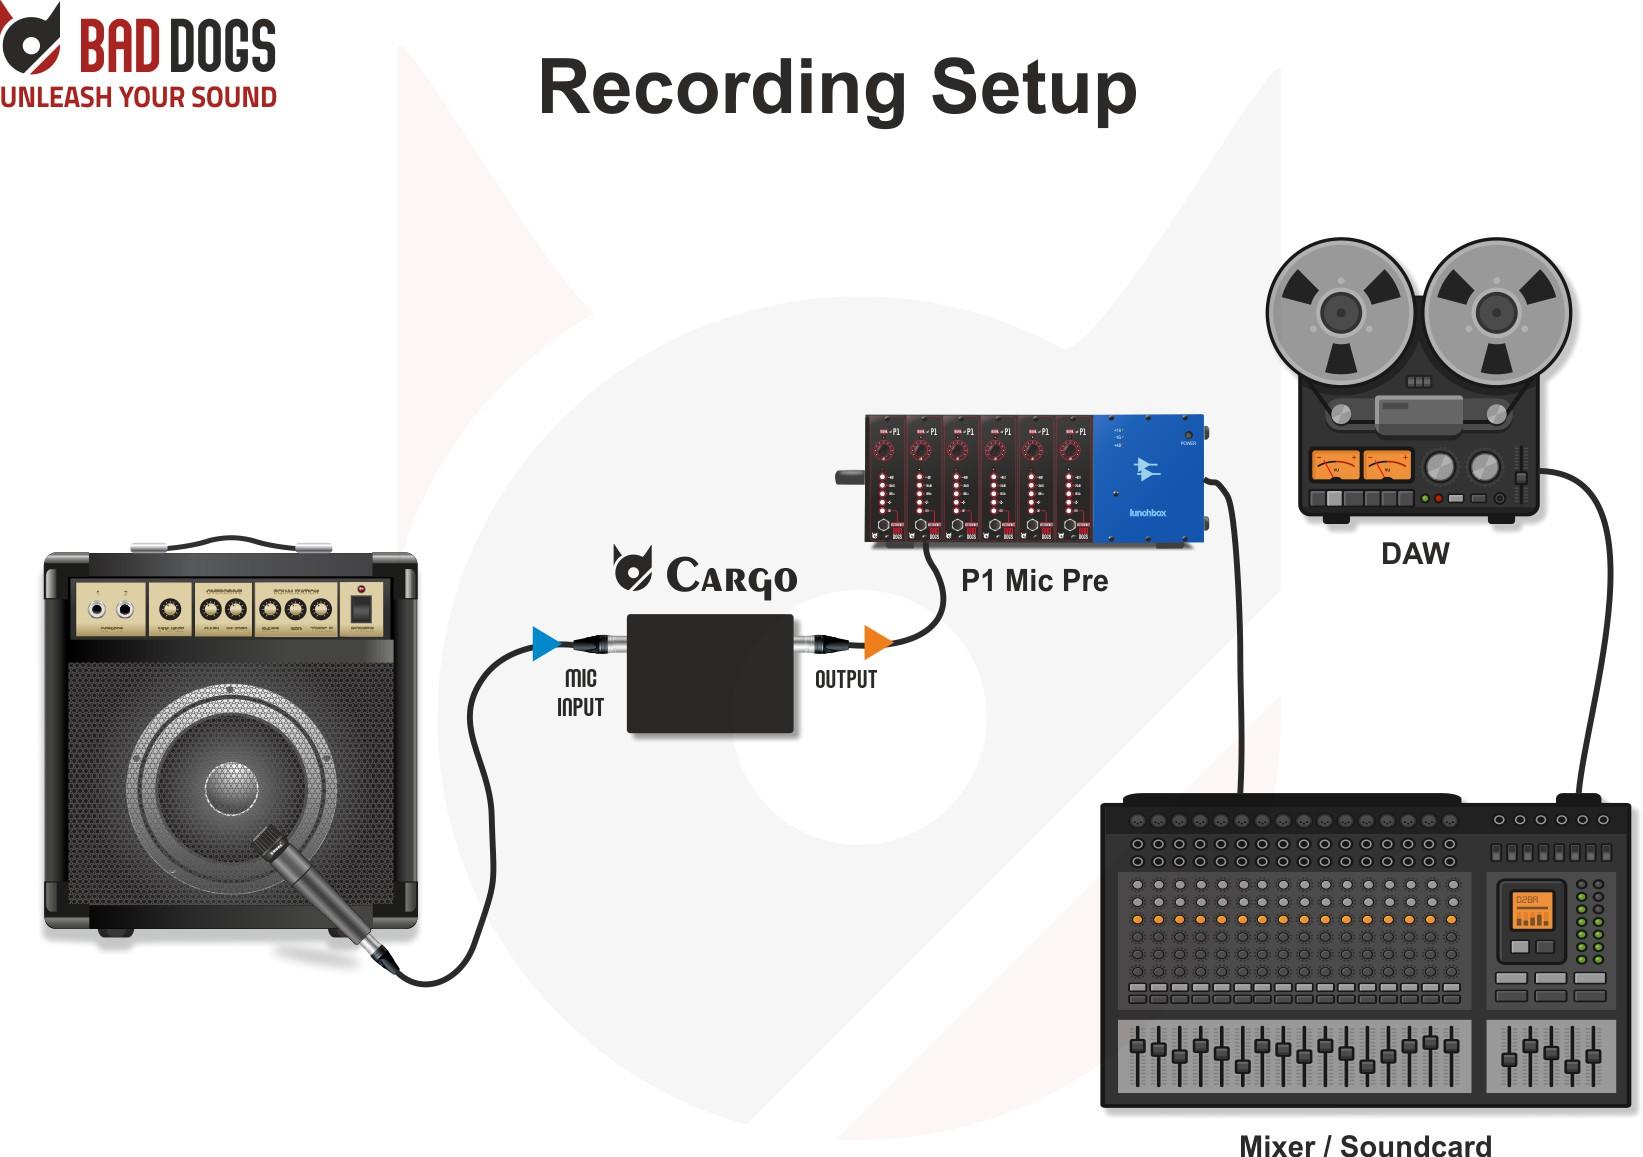 Cargo use case recording setup